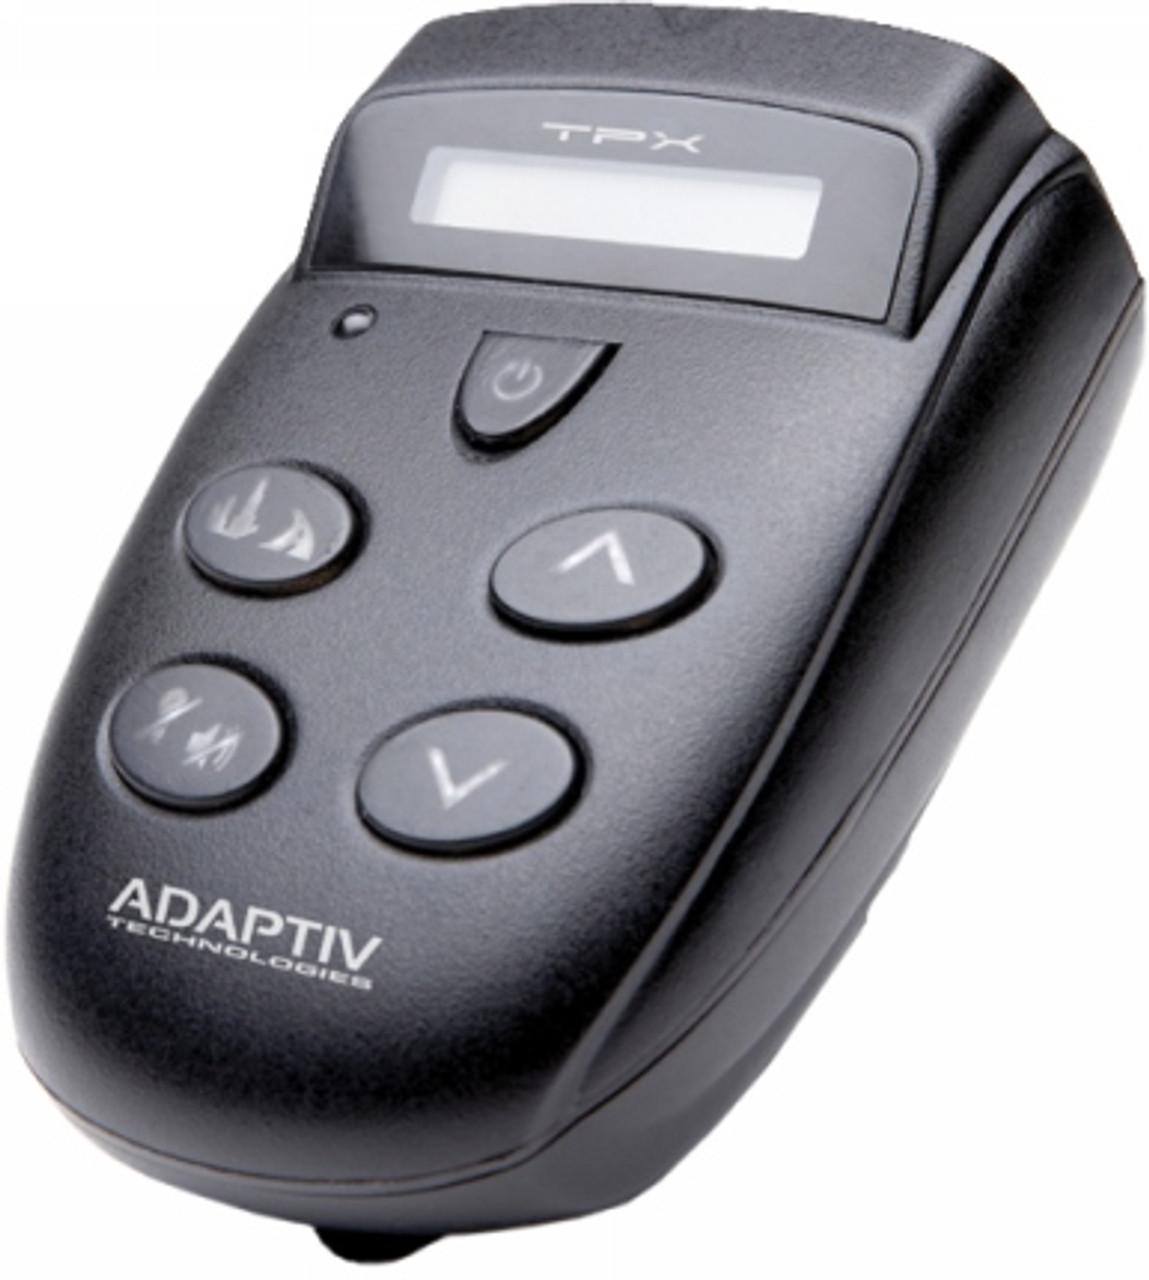 Visual Alert Adaptiv Radar Detector  A-02-02